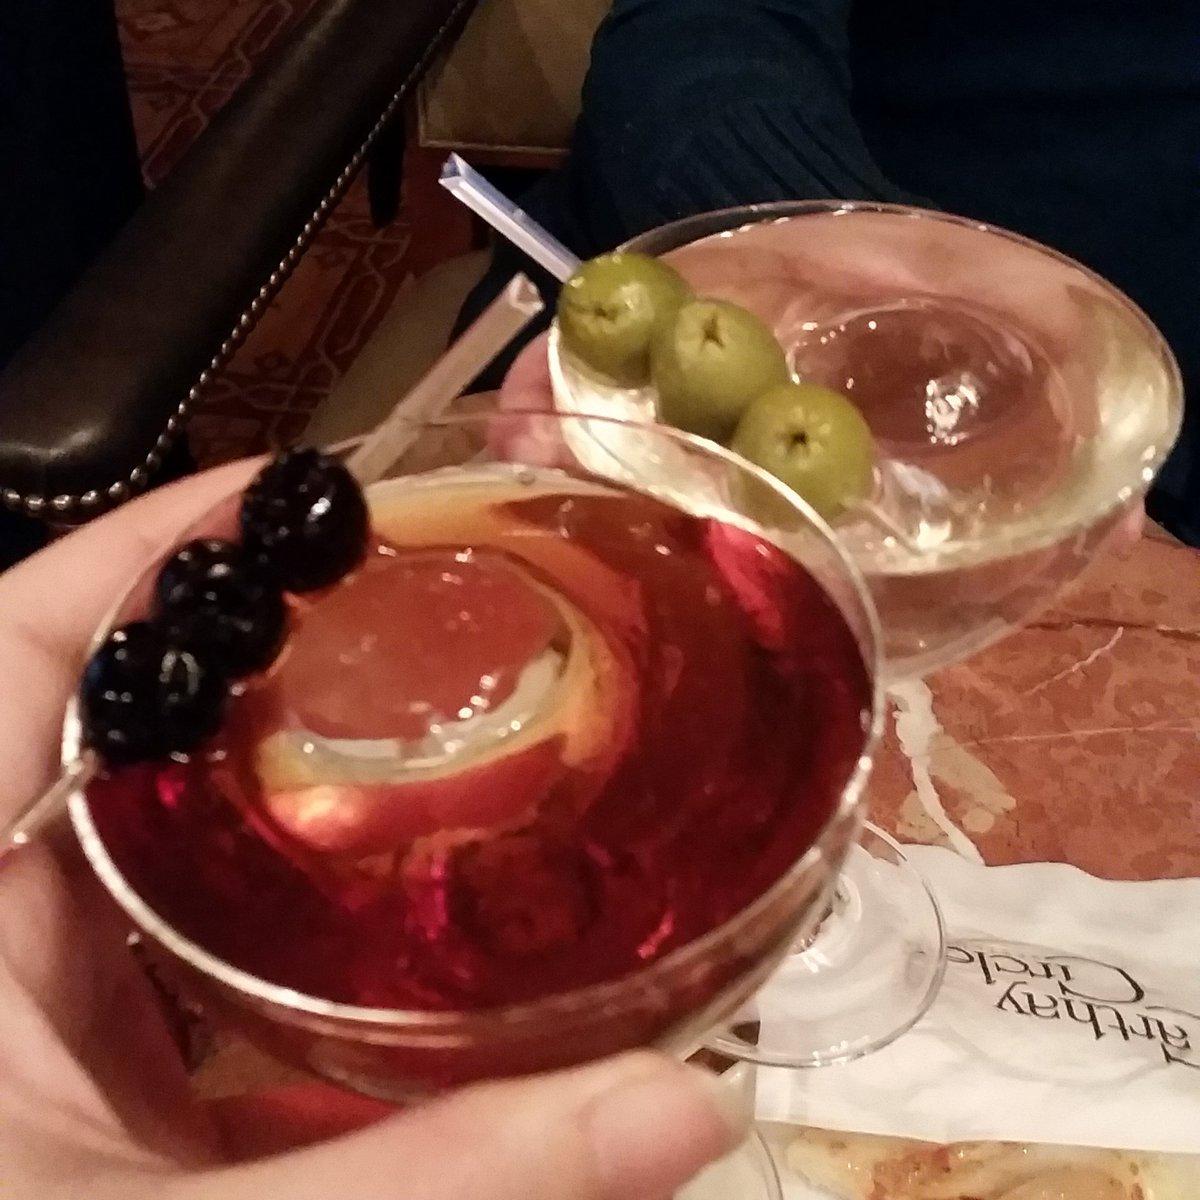 Manhattan and dirty martini, FTW!  #MomsgoneDisney #disneyside #CaliforniaAdventure #CarthayCircle @Disneyland @CultPerfectMoms<br>http://pic.twitter.com/3BBefre4wg